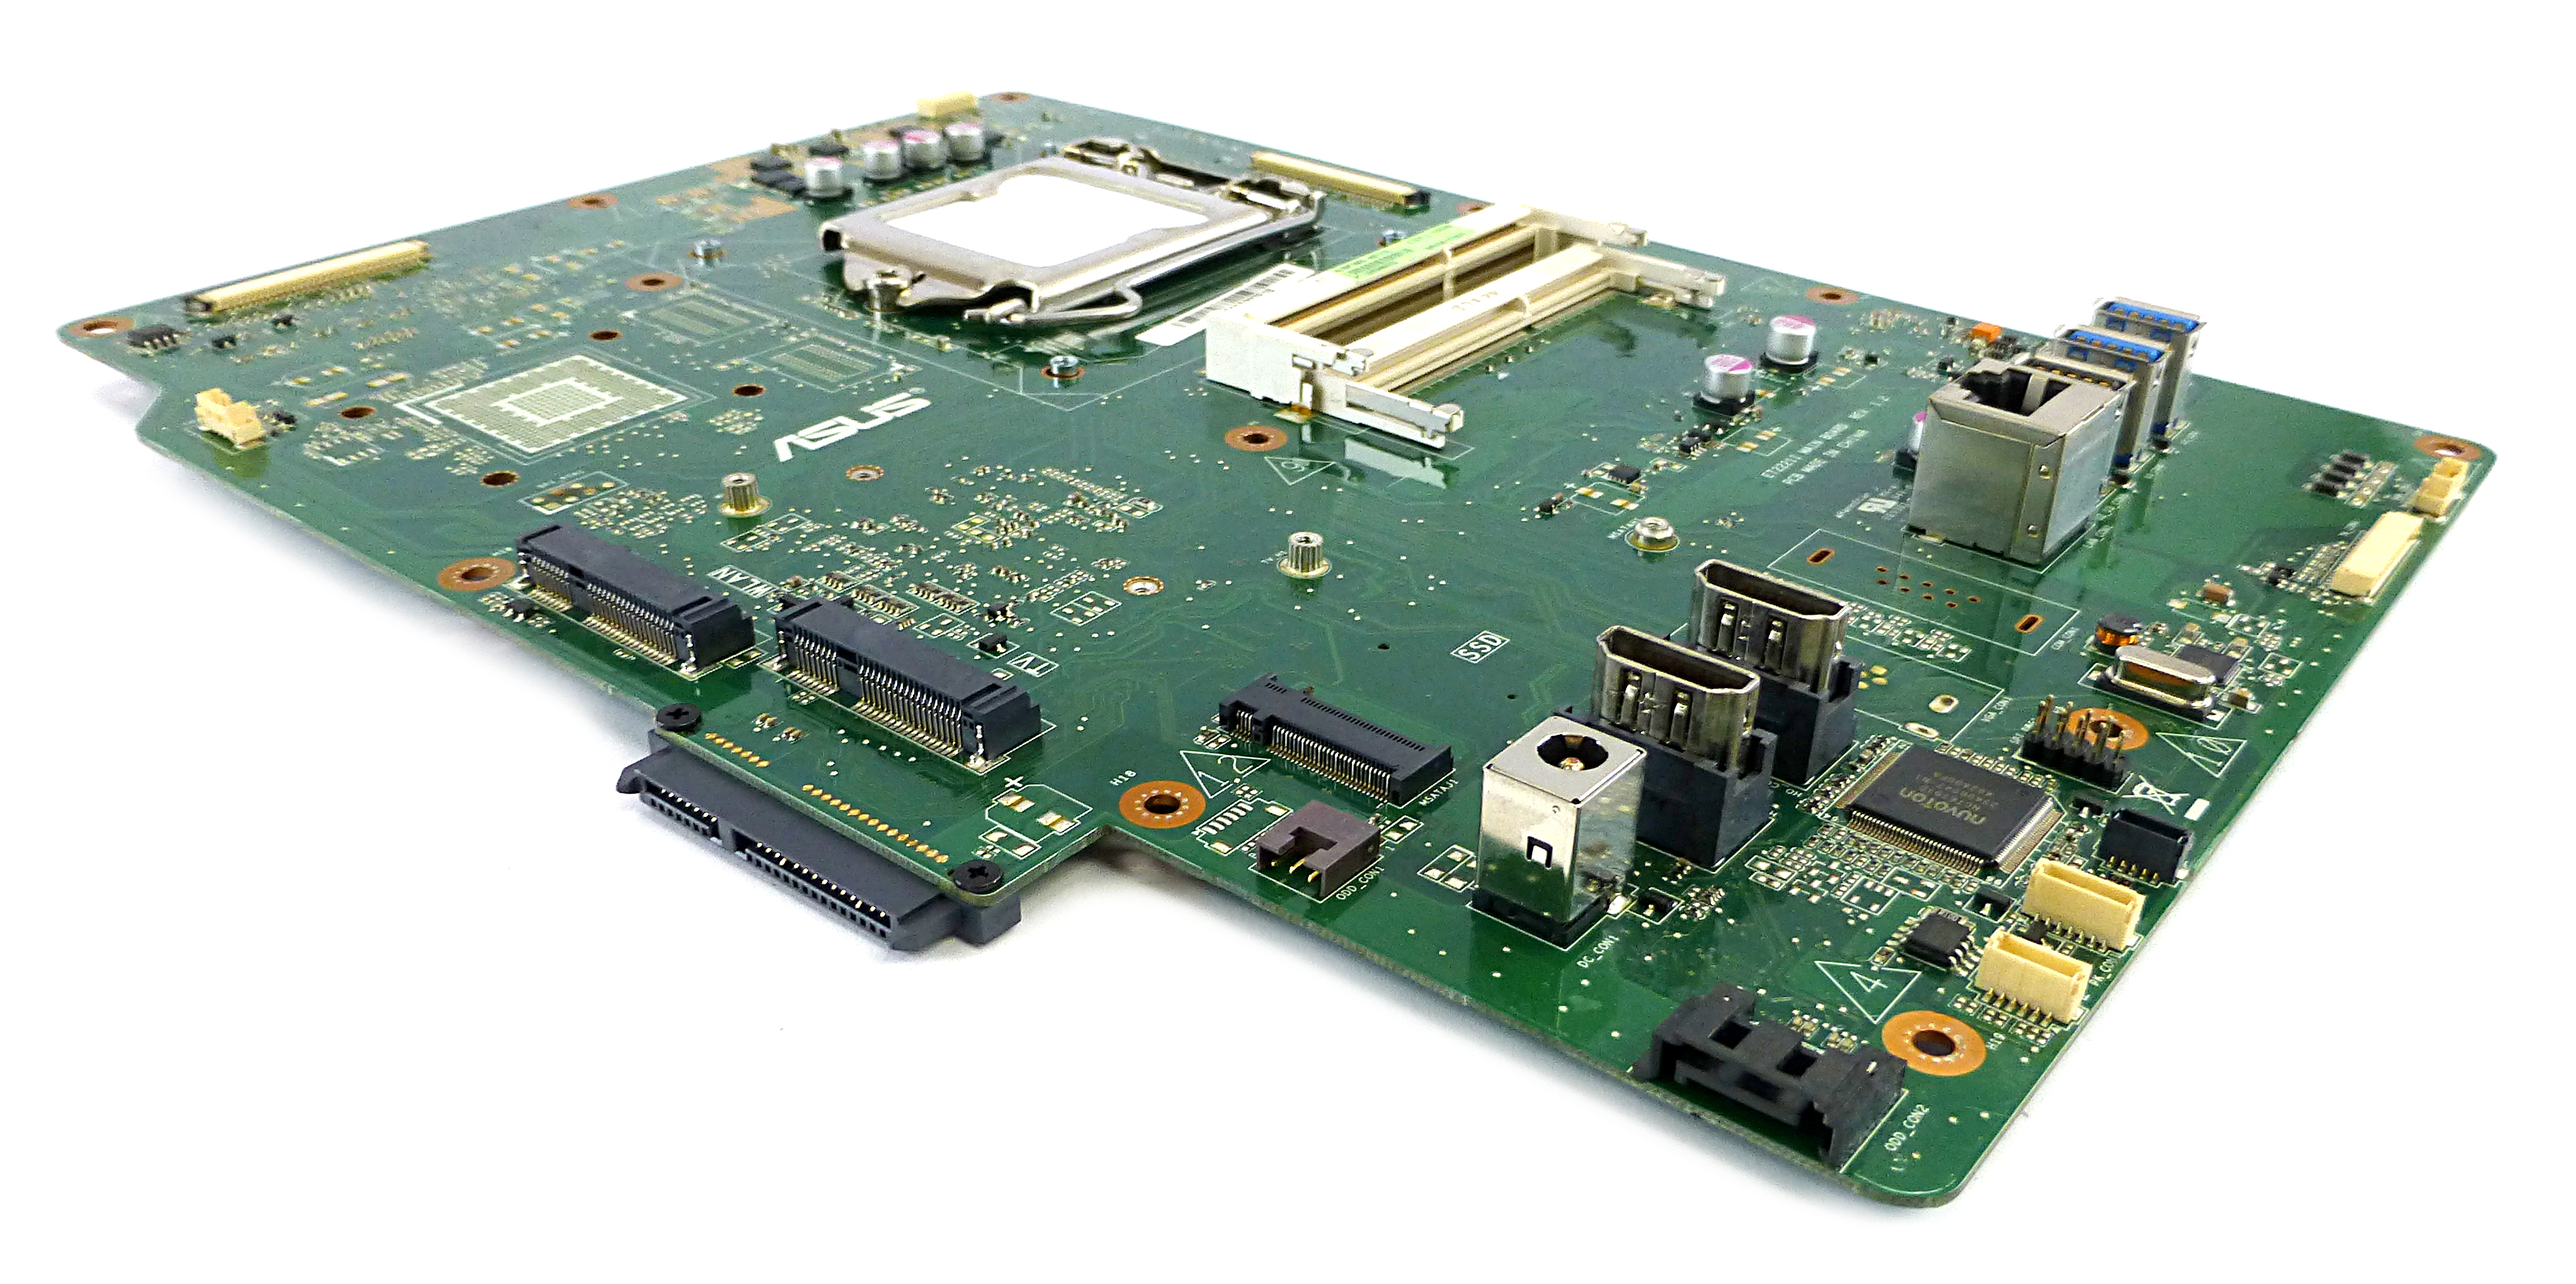 60PT00R0-MB1C14 Asus (ET2221I Rev 1.2) Intel Socket 1150 AiO PC Motherboard